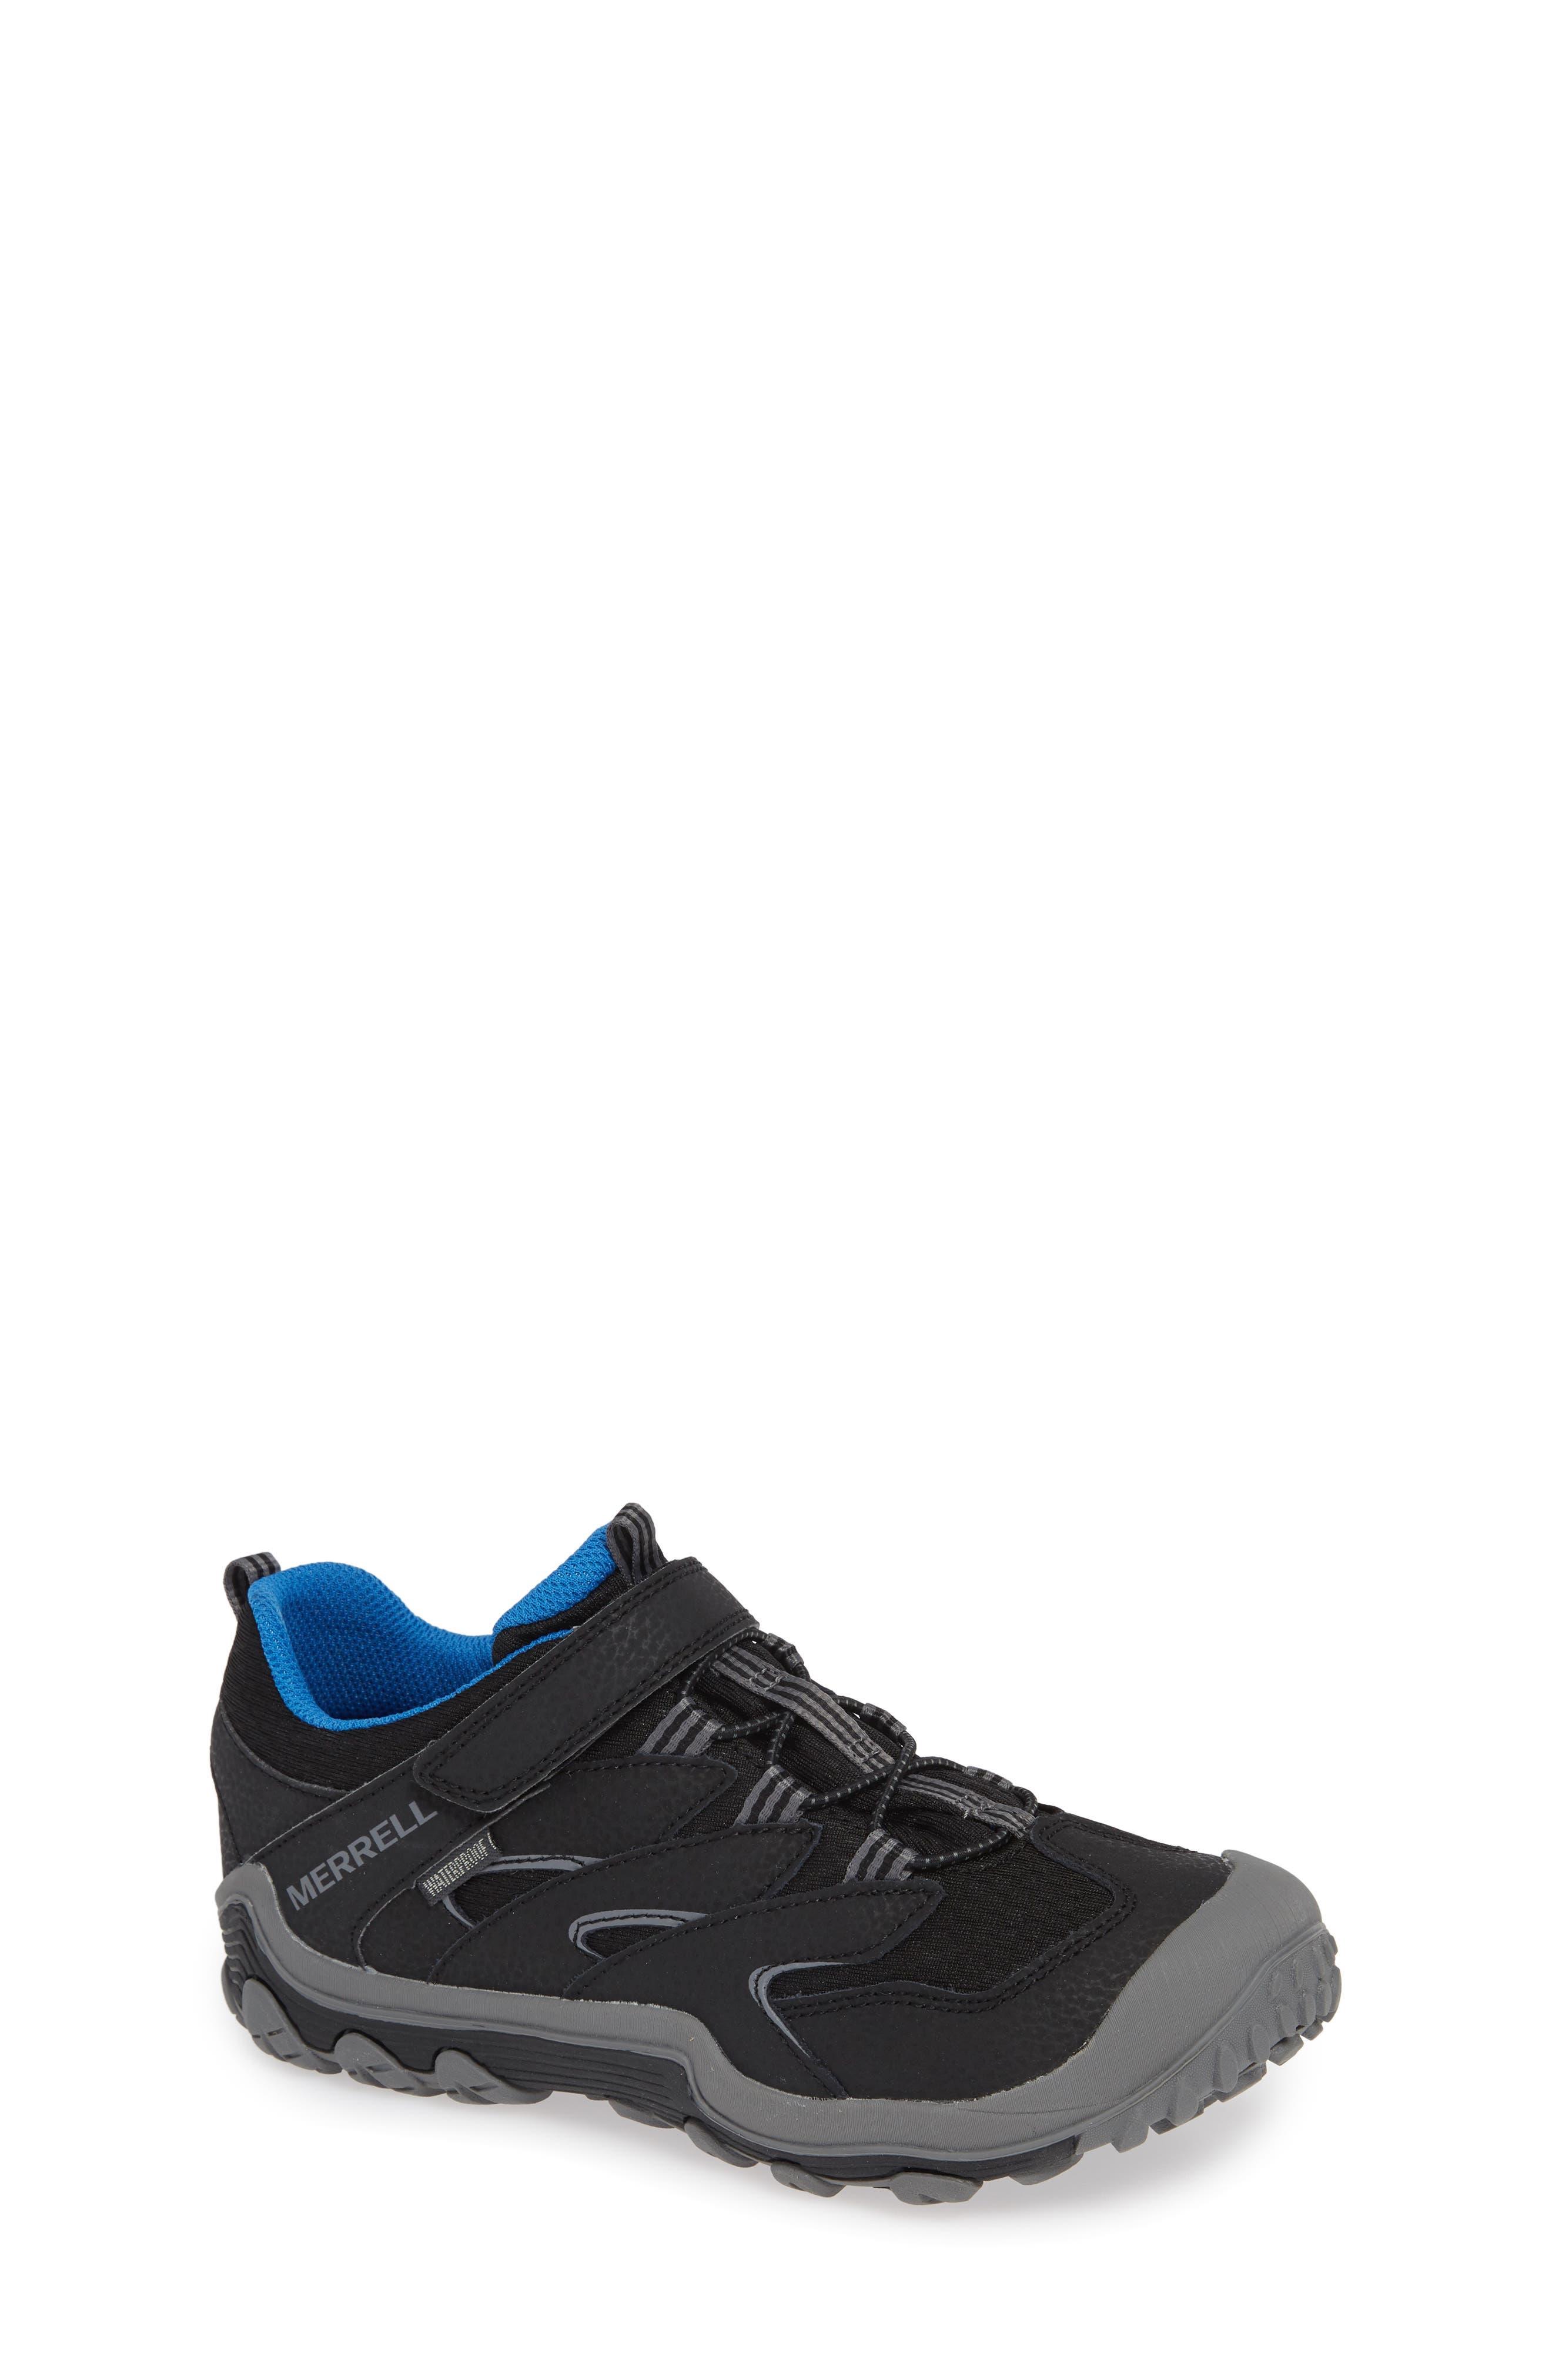 Chameleon 7 Waterproof Sneaker,                             Main thumbnail 1, color,                             BLACK